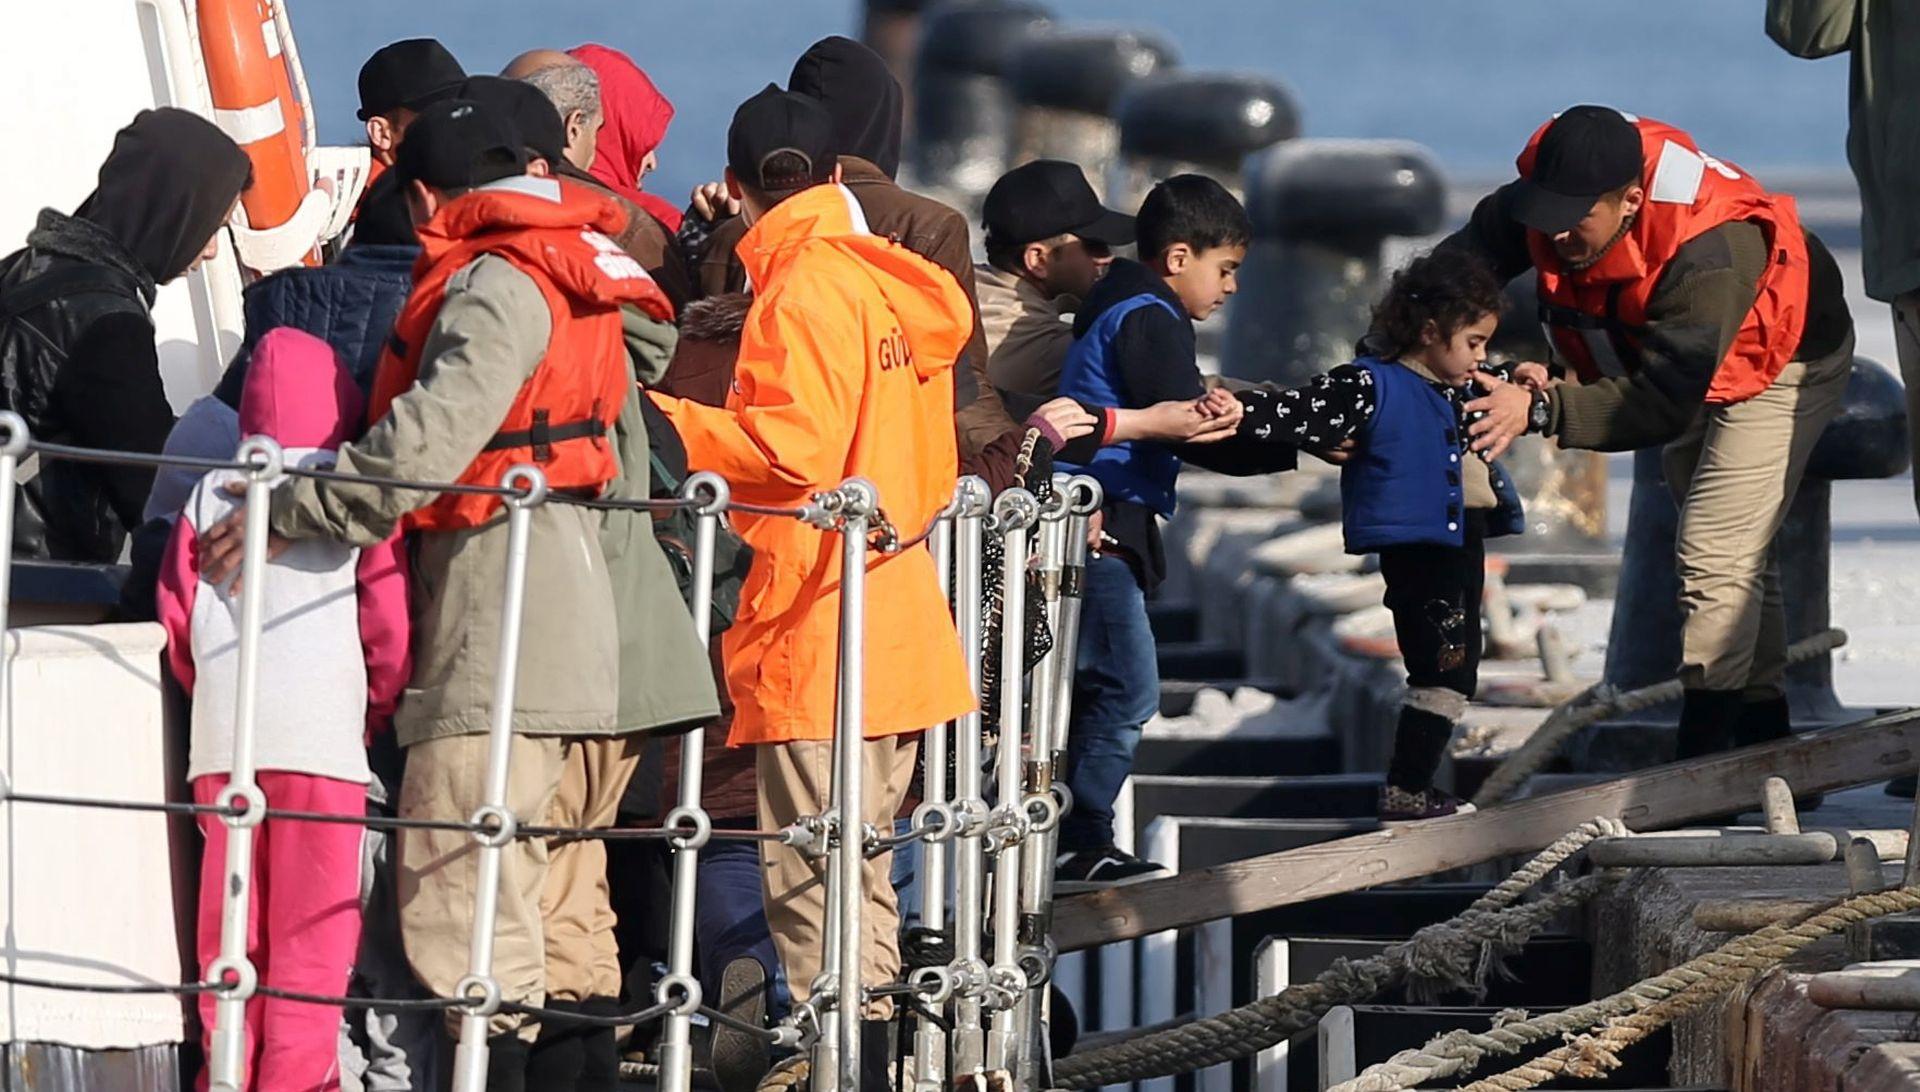 Italija spasila 1850 migranata u Sicilijanskom prolazu